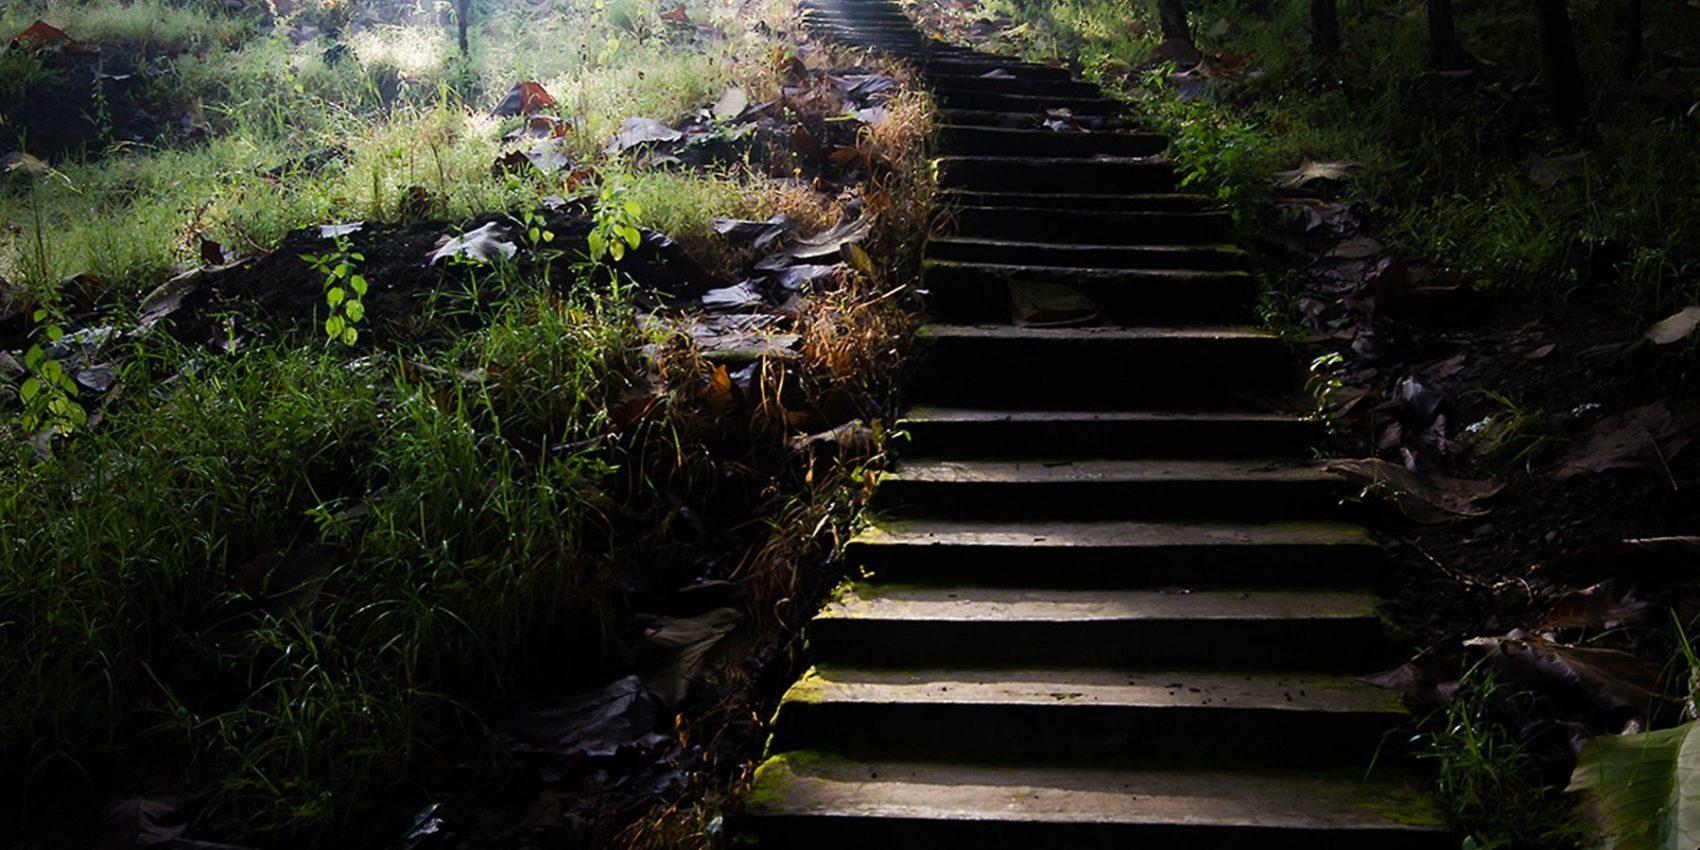 daylight-environment-flora-999311 (2)